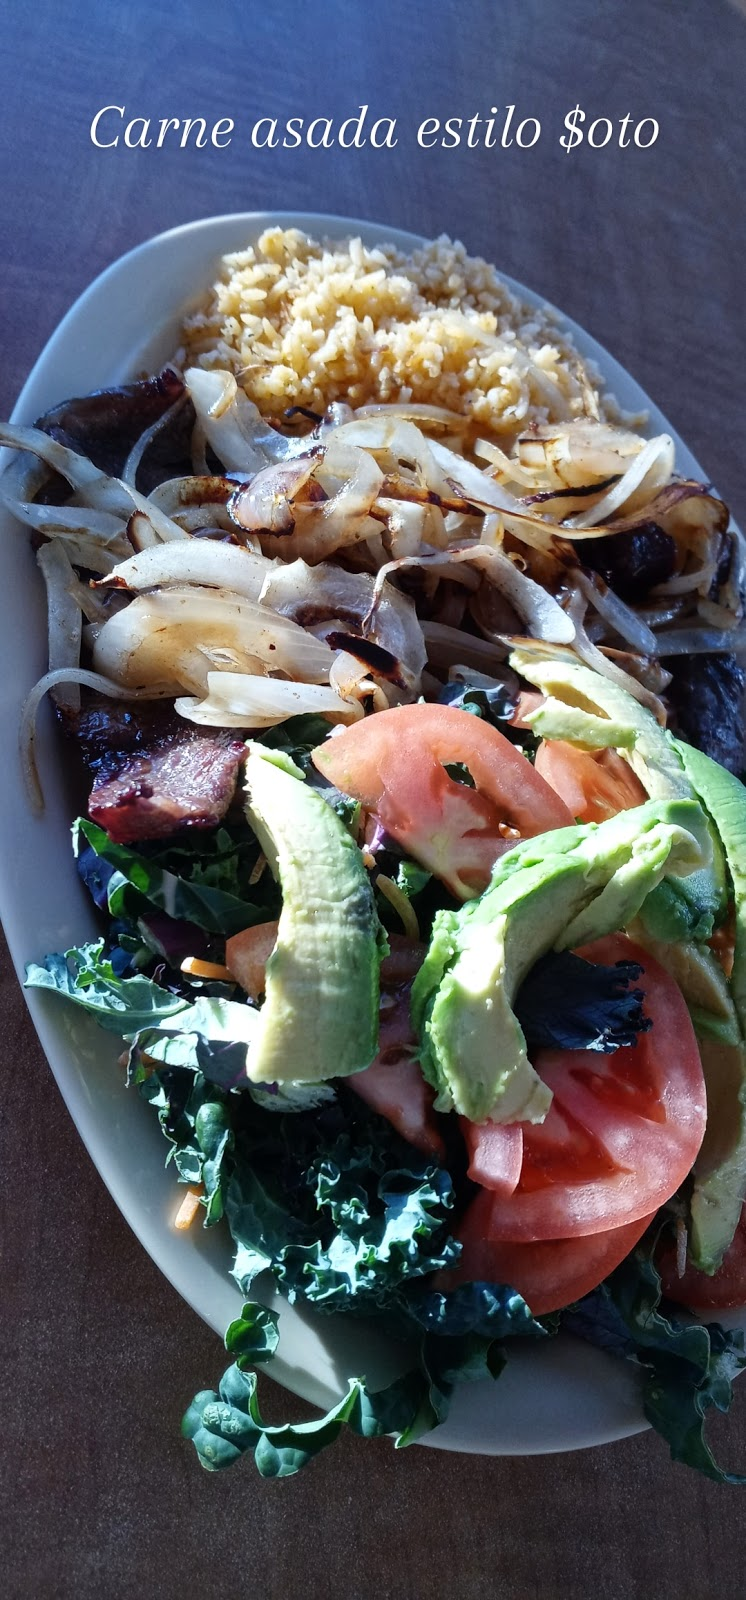 El Portal De Morelia - restaurant  | Photo 9 of 10 | Address: 3601 Foothill Blvd, Oakland, CA 94601, USA | Phone: (510) 395-2595